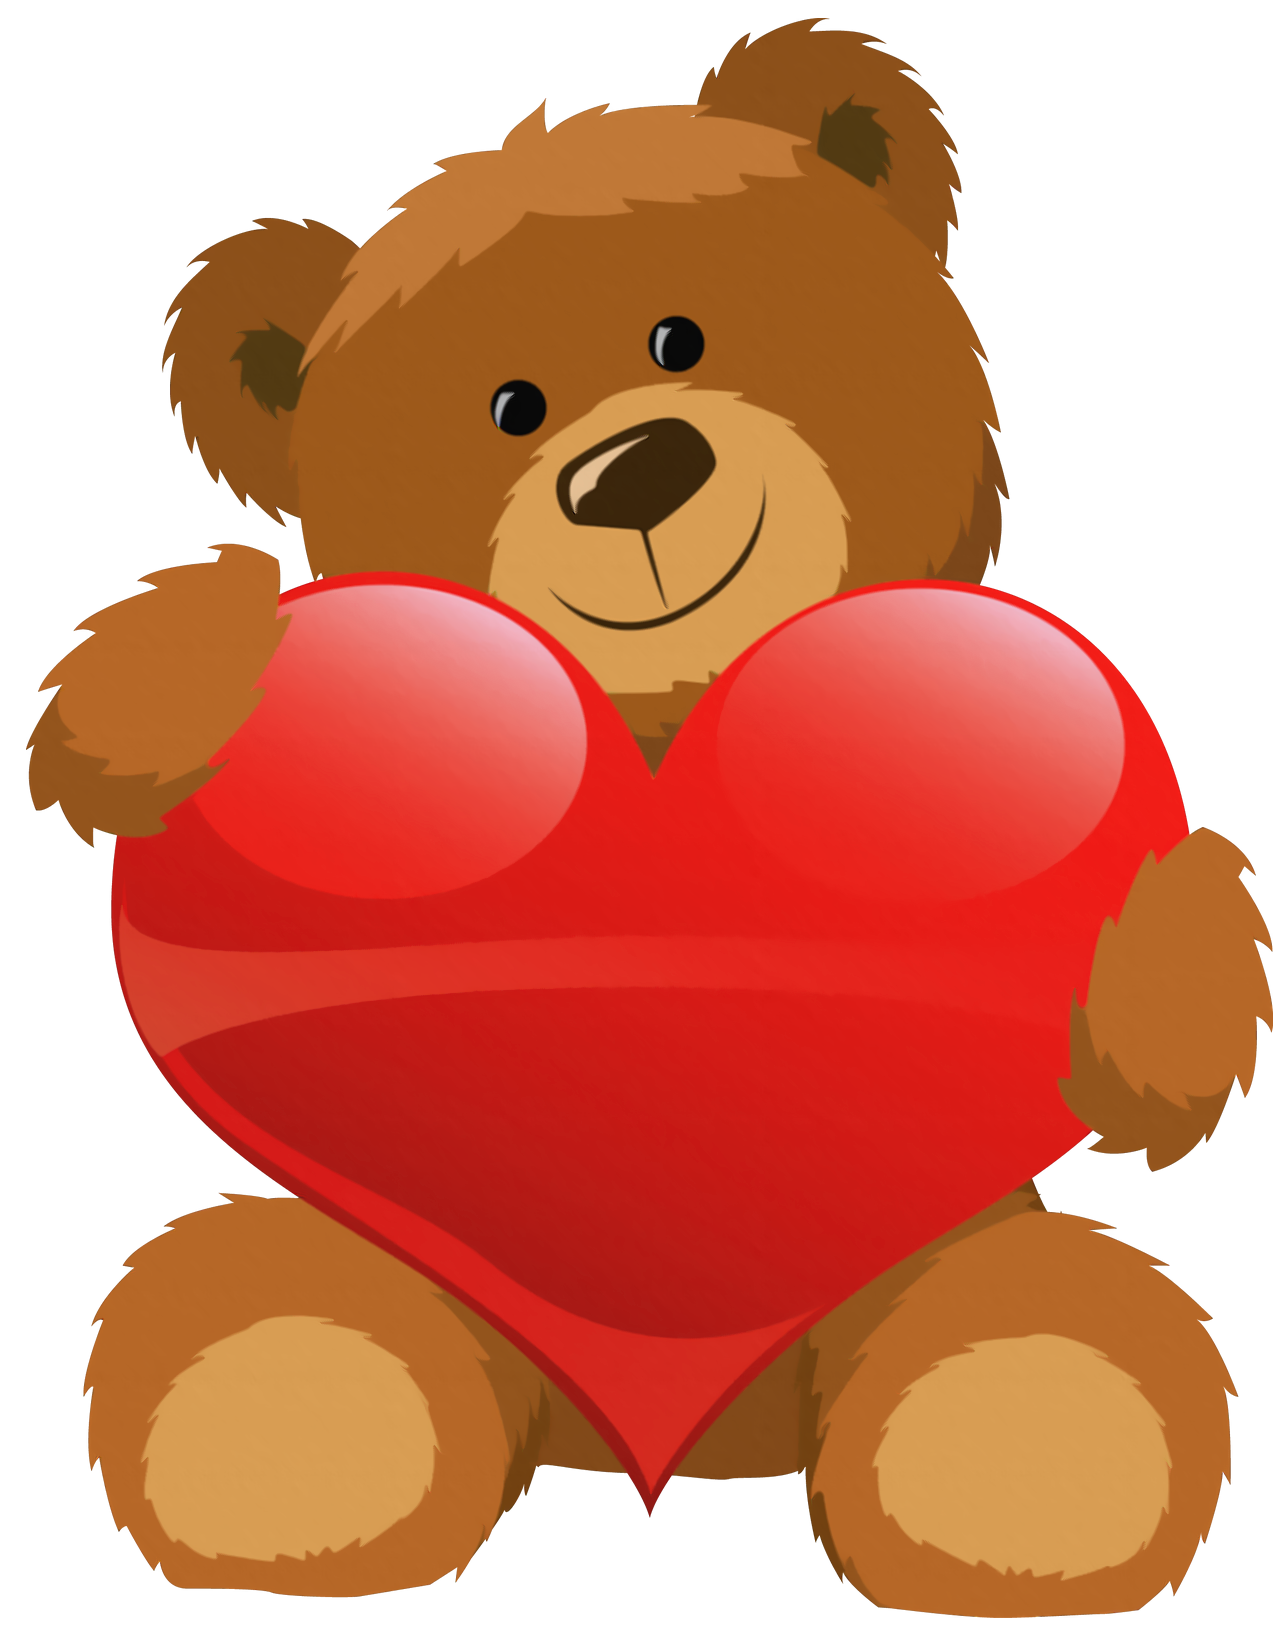 small resolution of teddy bear cute bear cute teddy clipart clipartmonk free clip art images 2 bear cartoon